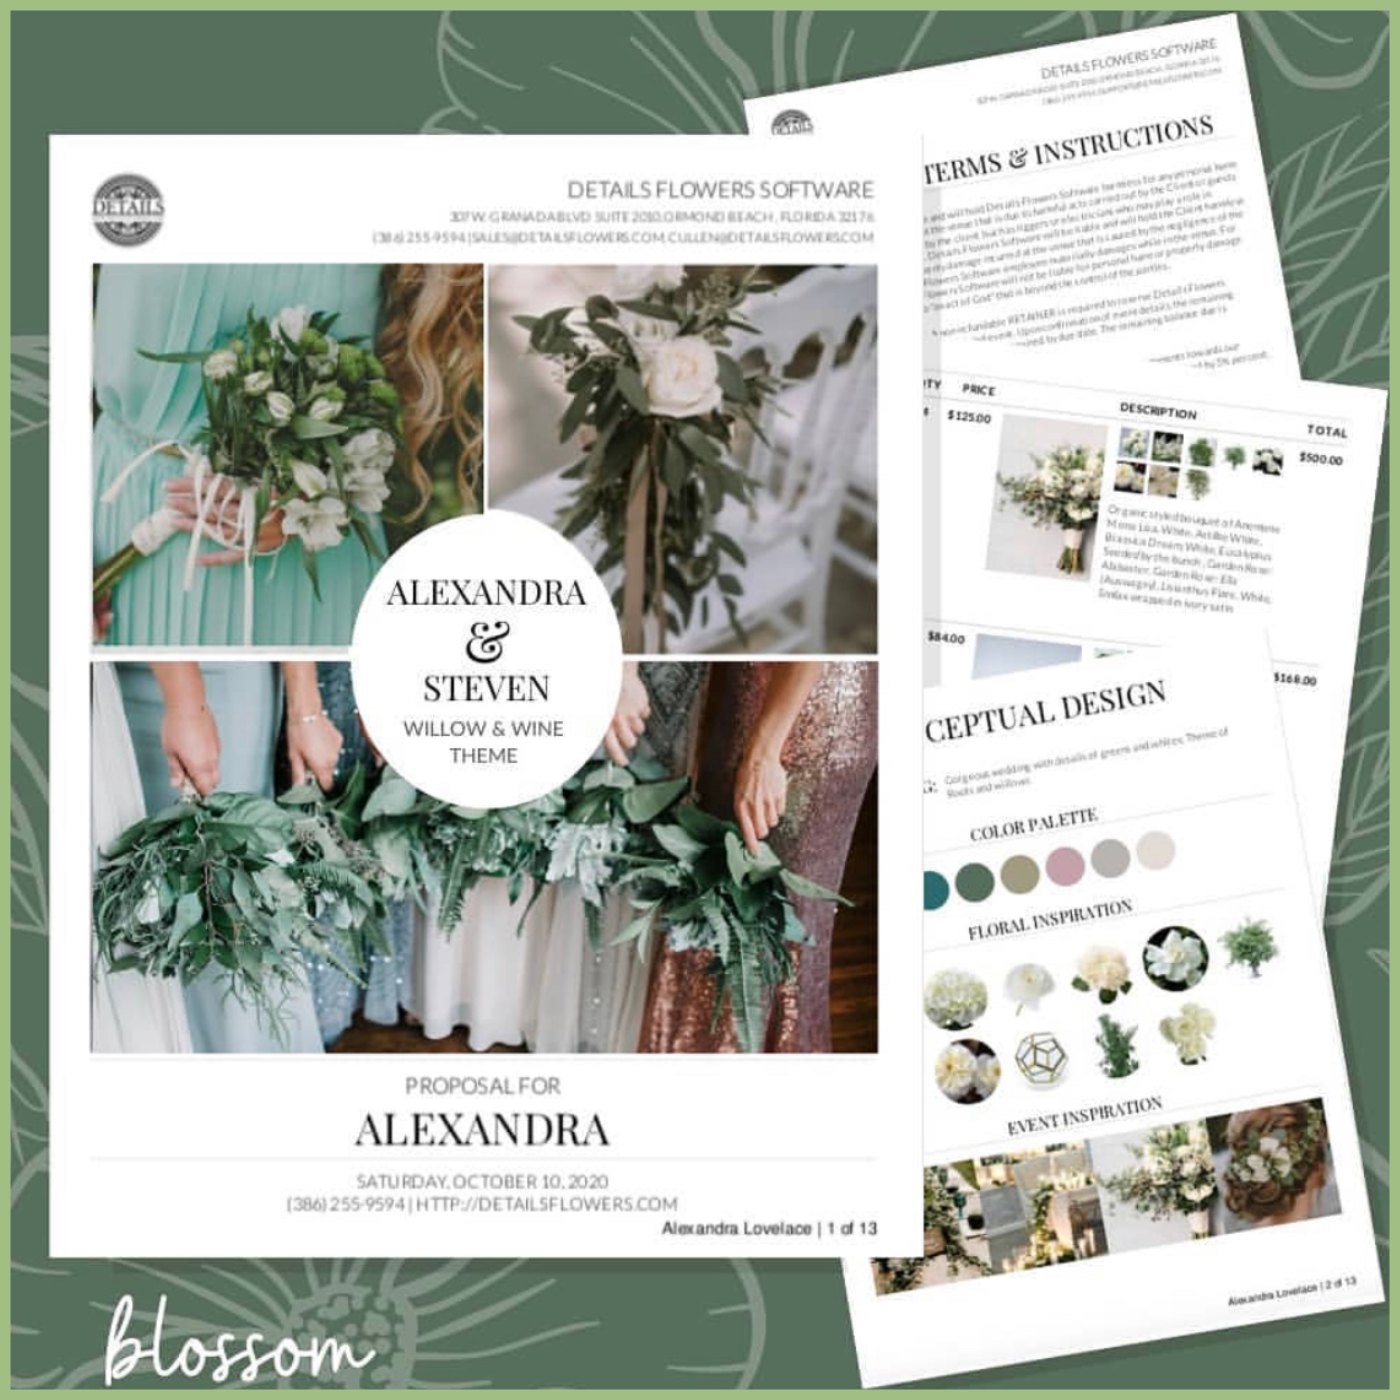 details flower software wedding contract